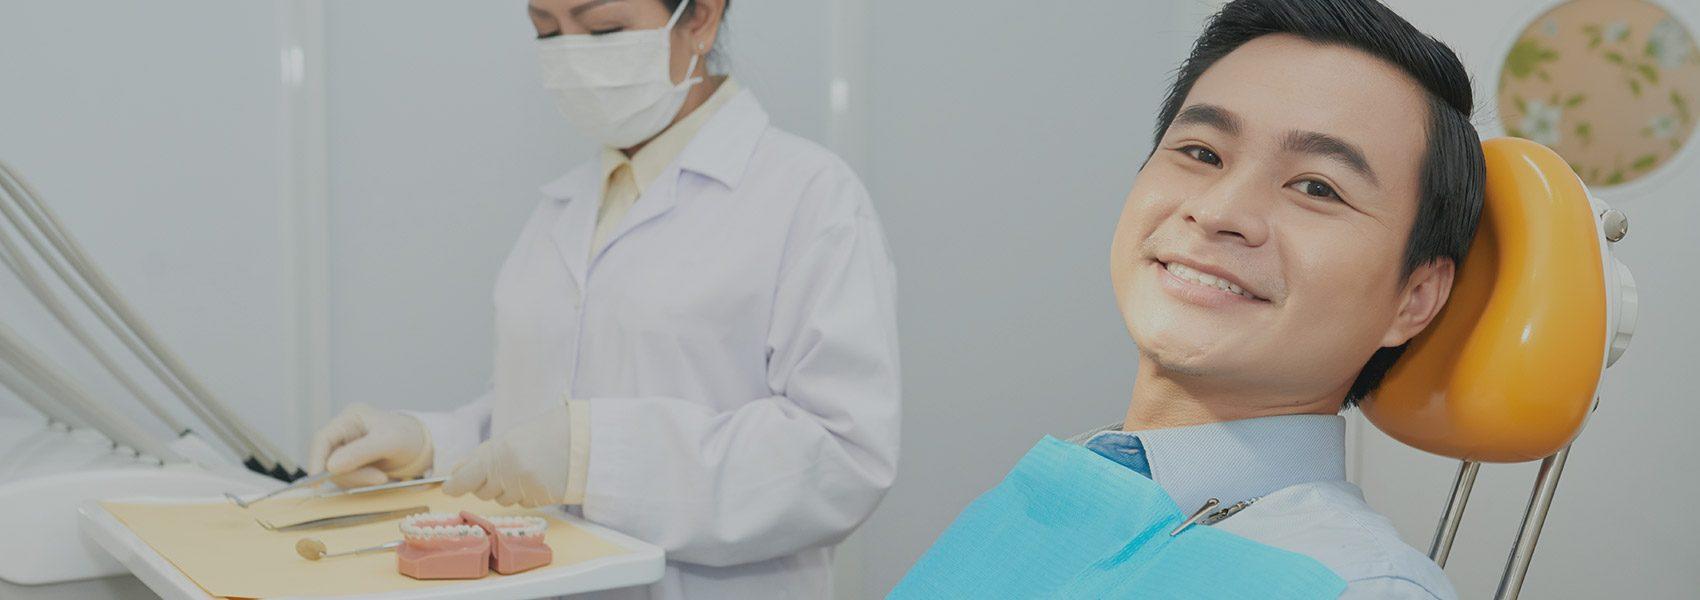 Teeth Cleaning - Distinctive Dentistry